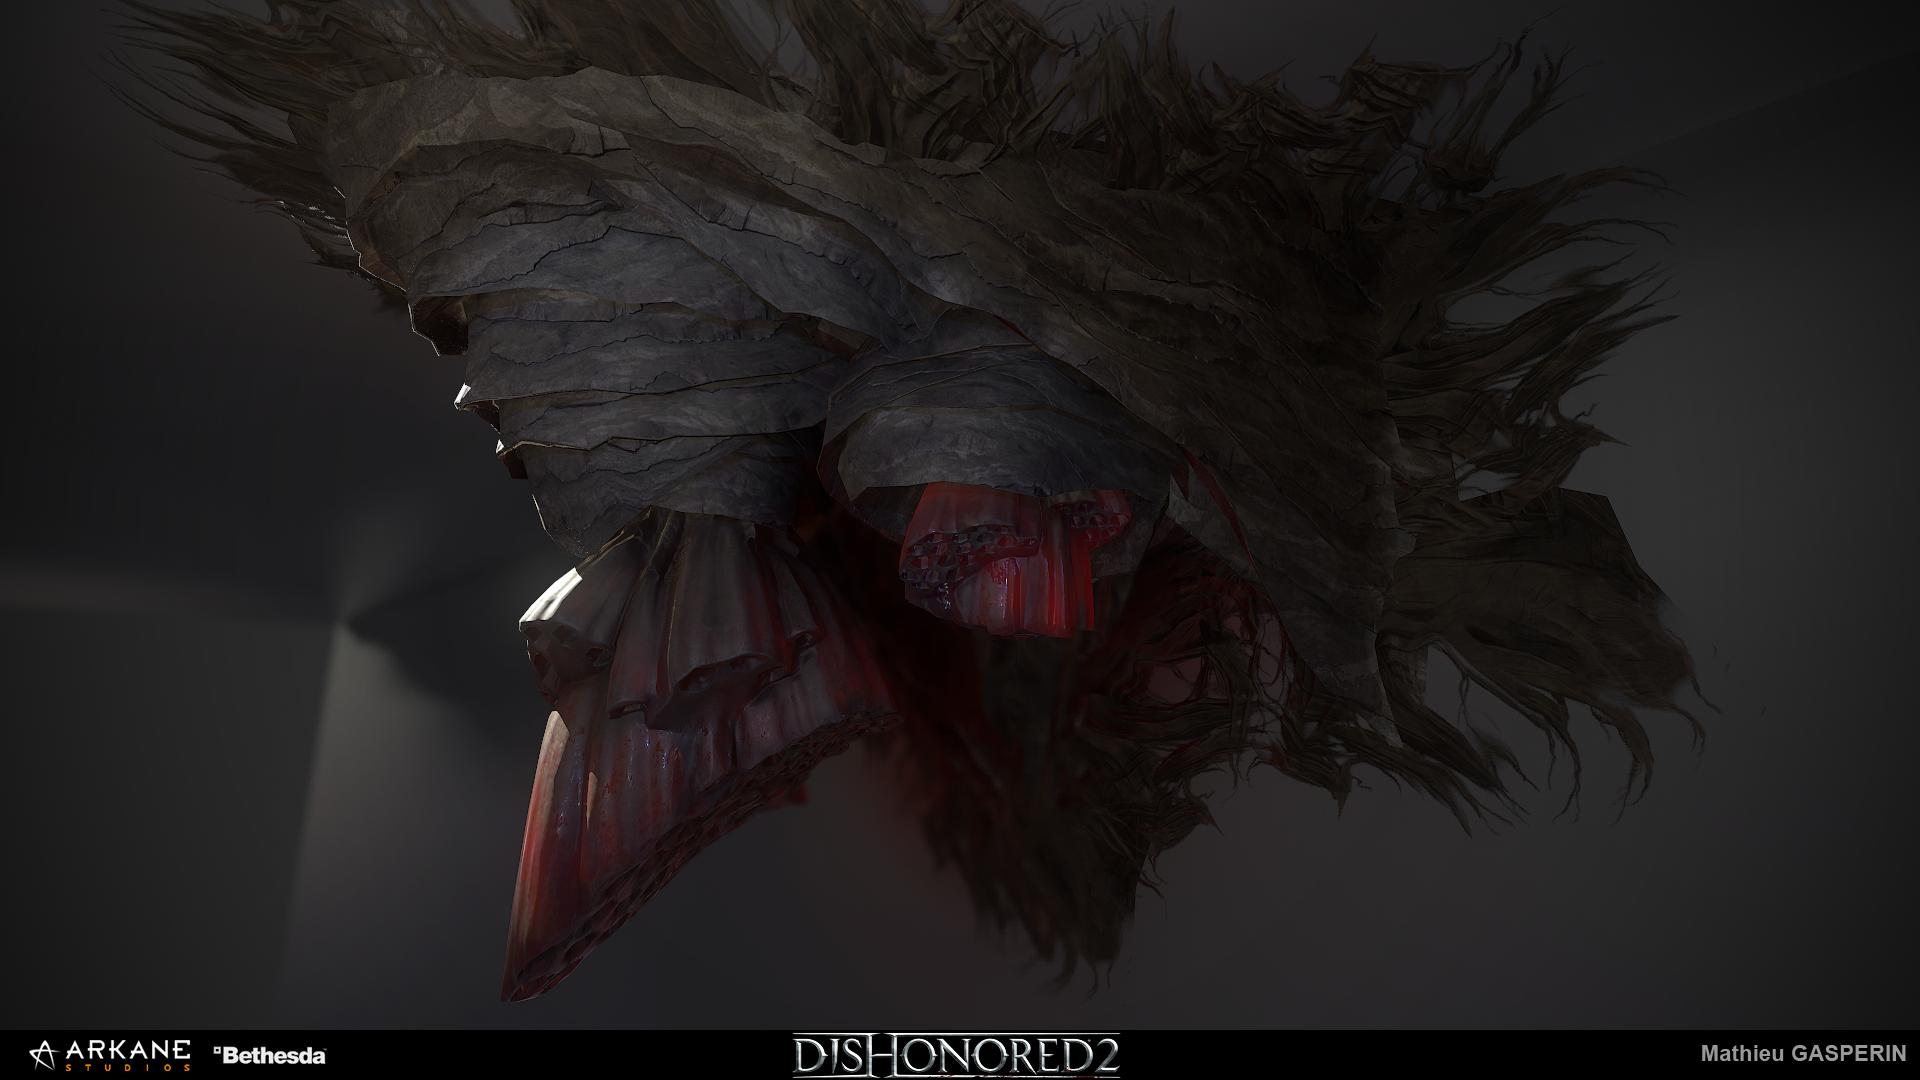 dishonored 2 art dump